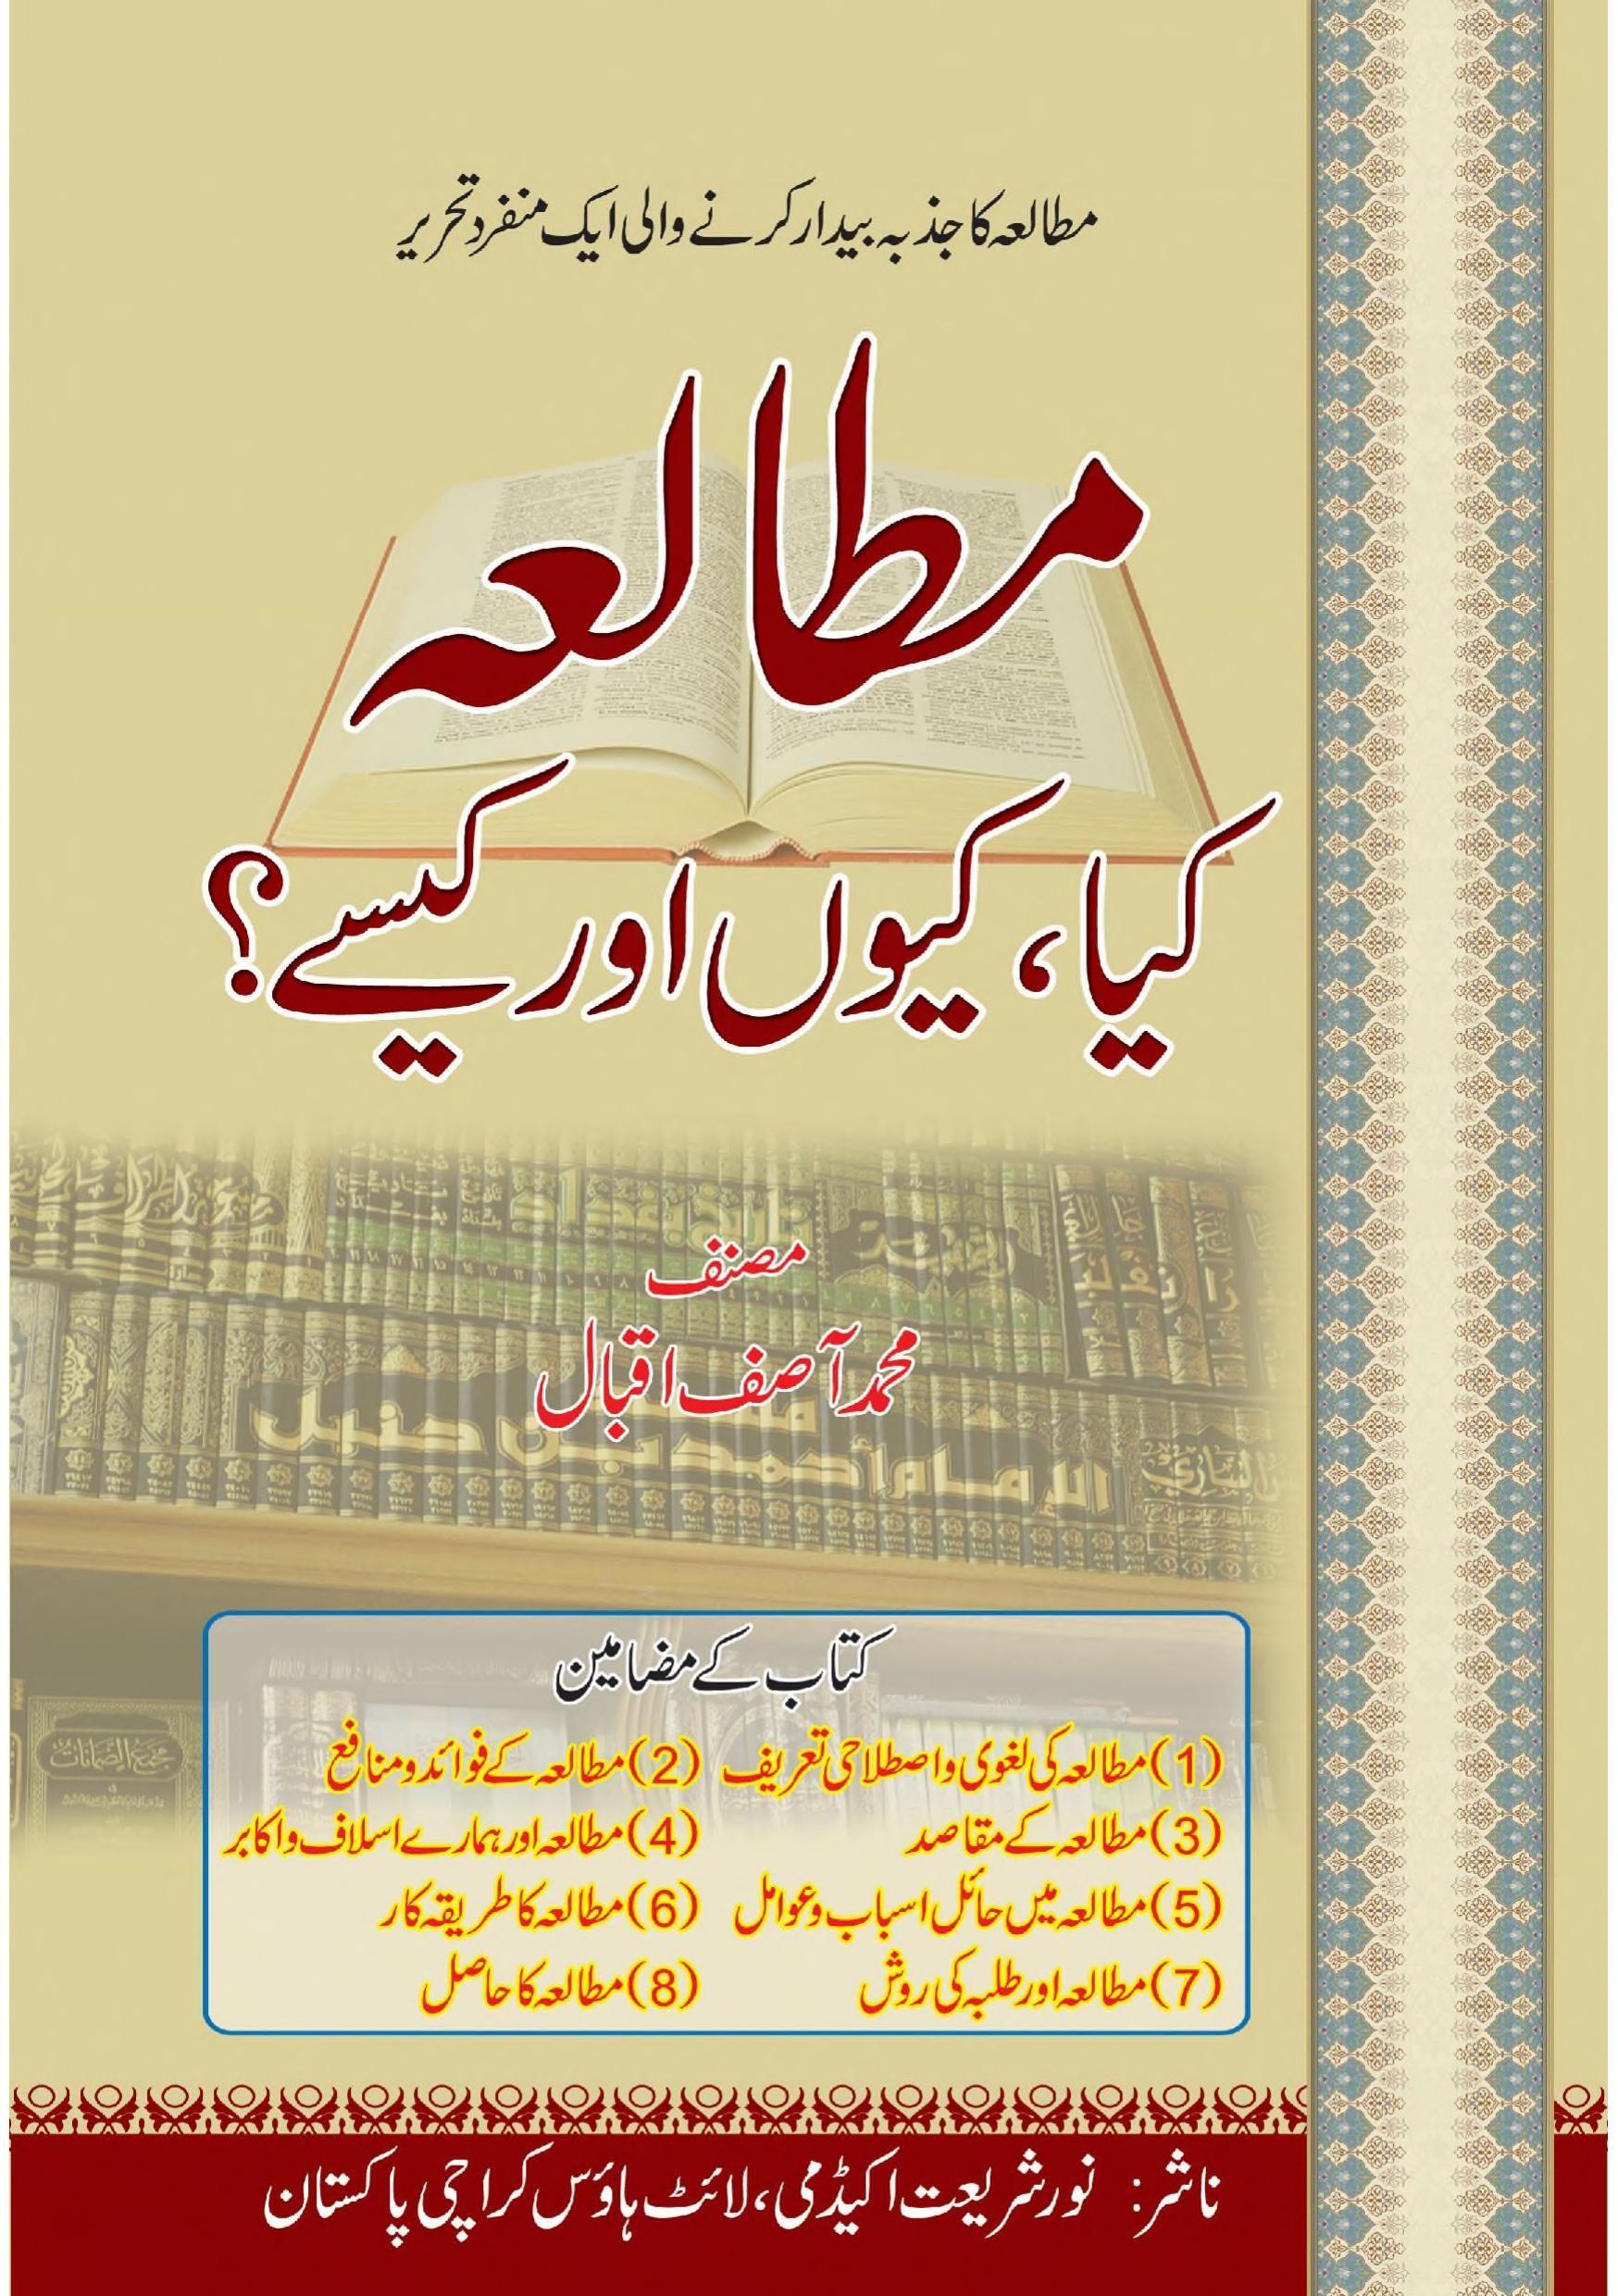 Mutalia Kya Q Aur Kasy مطالعہ کیا کیوں اور کیسے M Awais